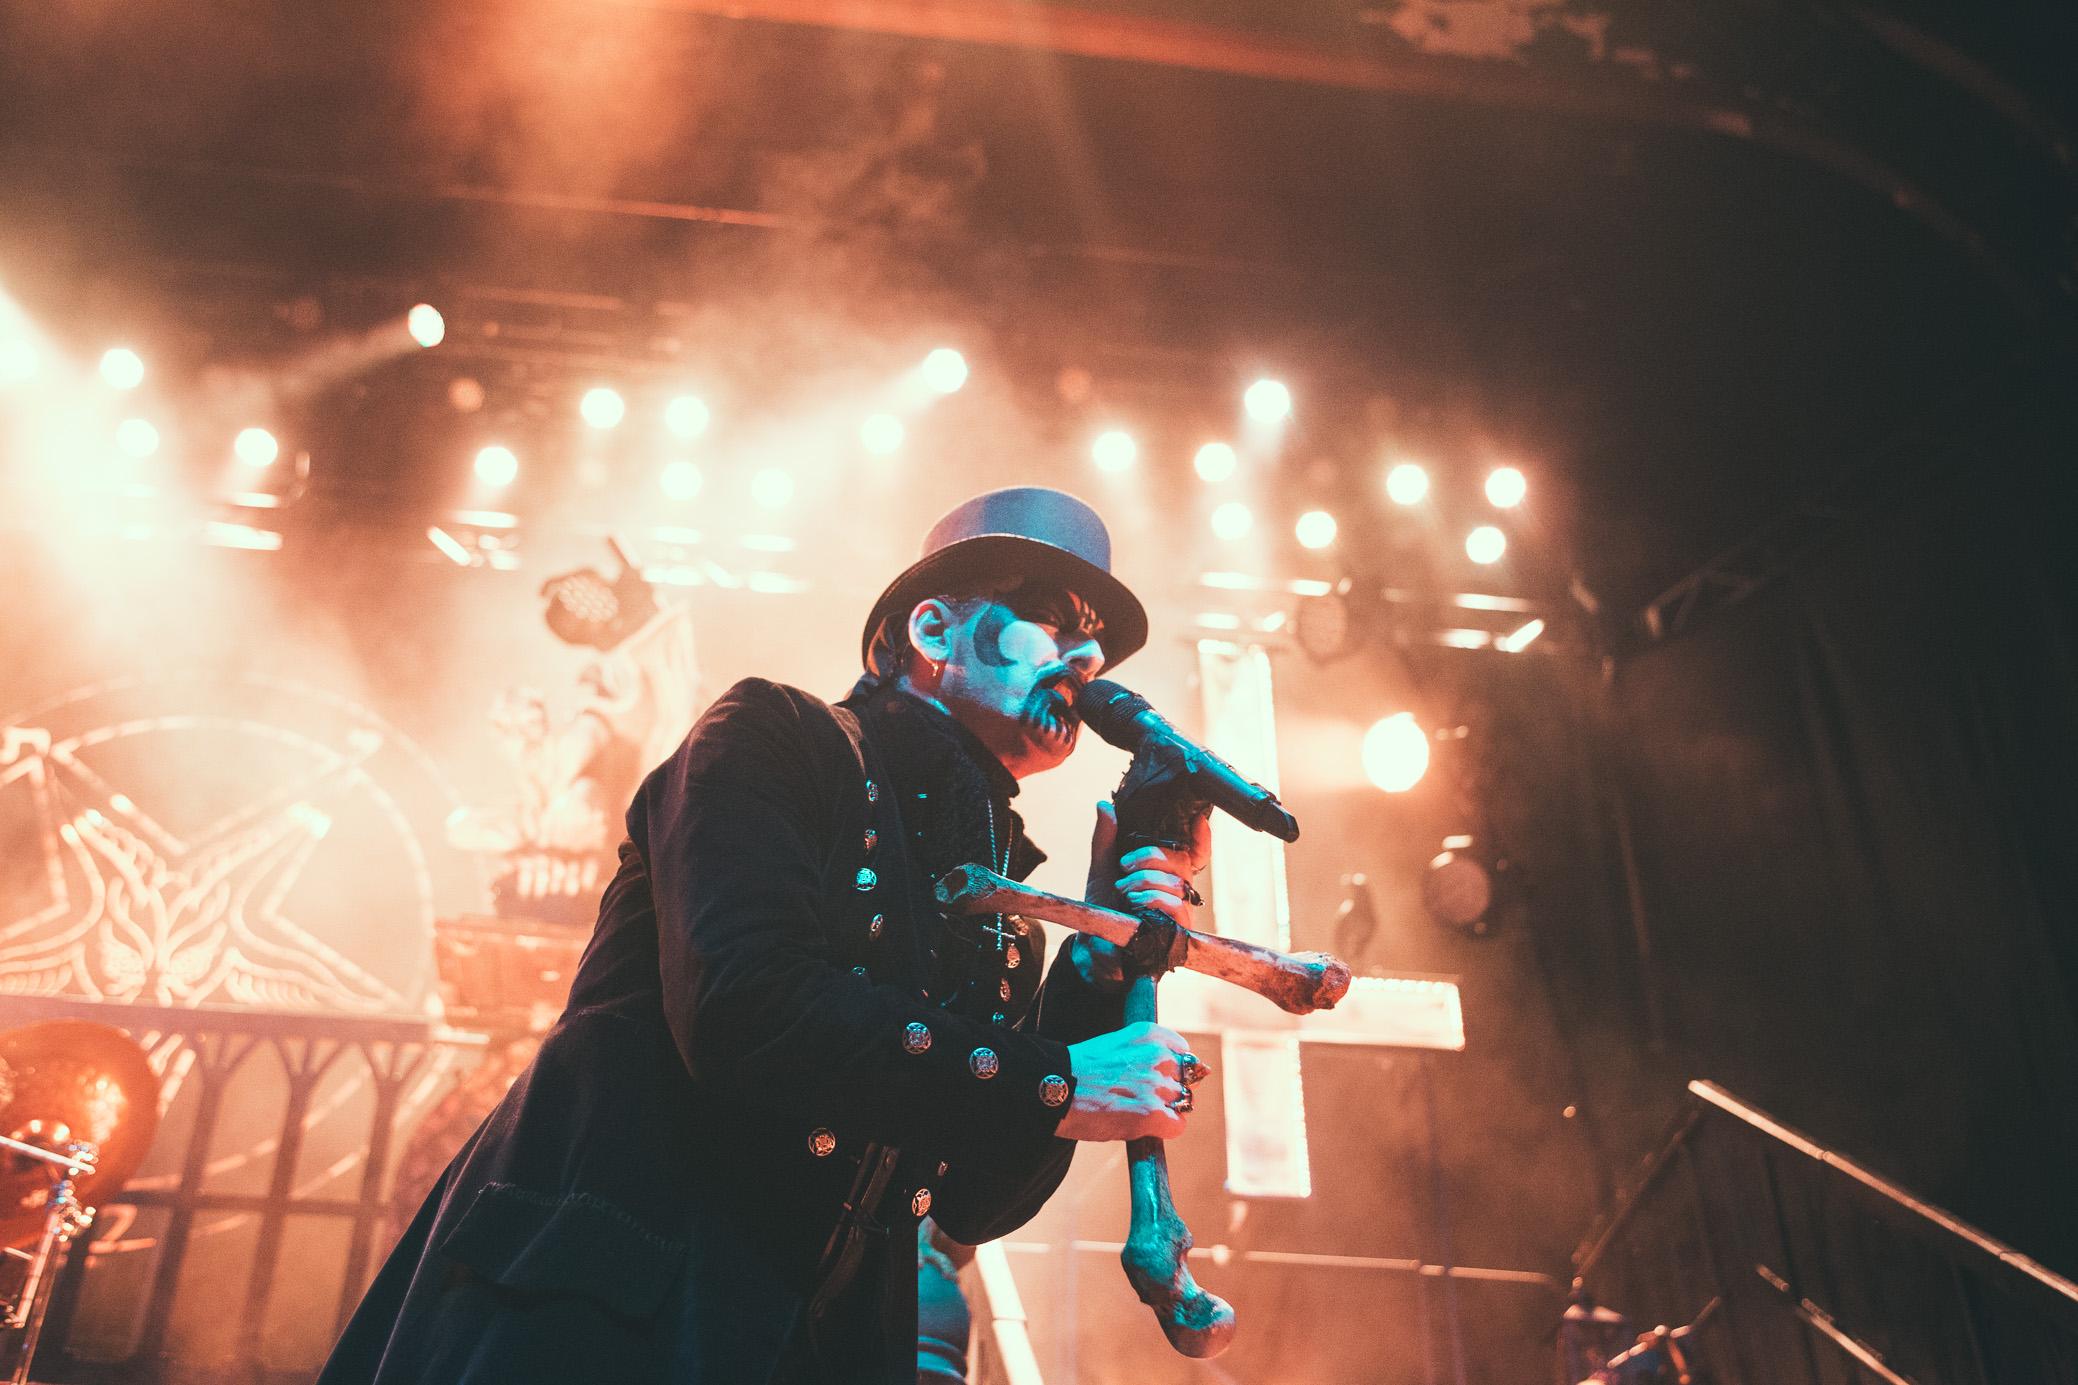 King Diamond performs at The Tabernacle in Atlanta, Georgia on November 16th, 2015.   (Photo by David A. Smith/DSmithScenes)